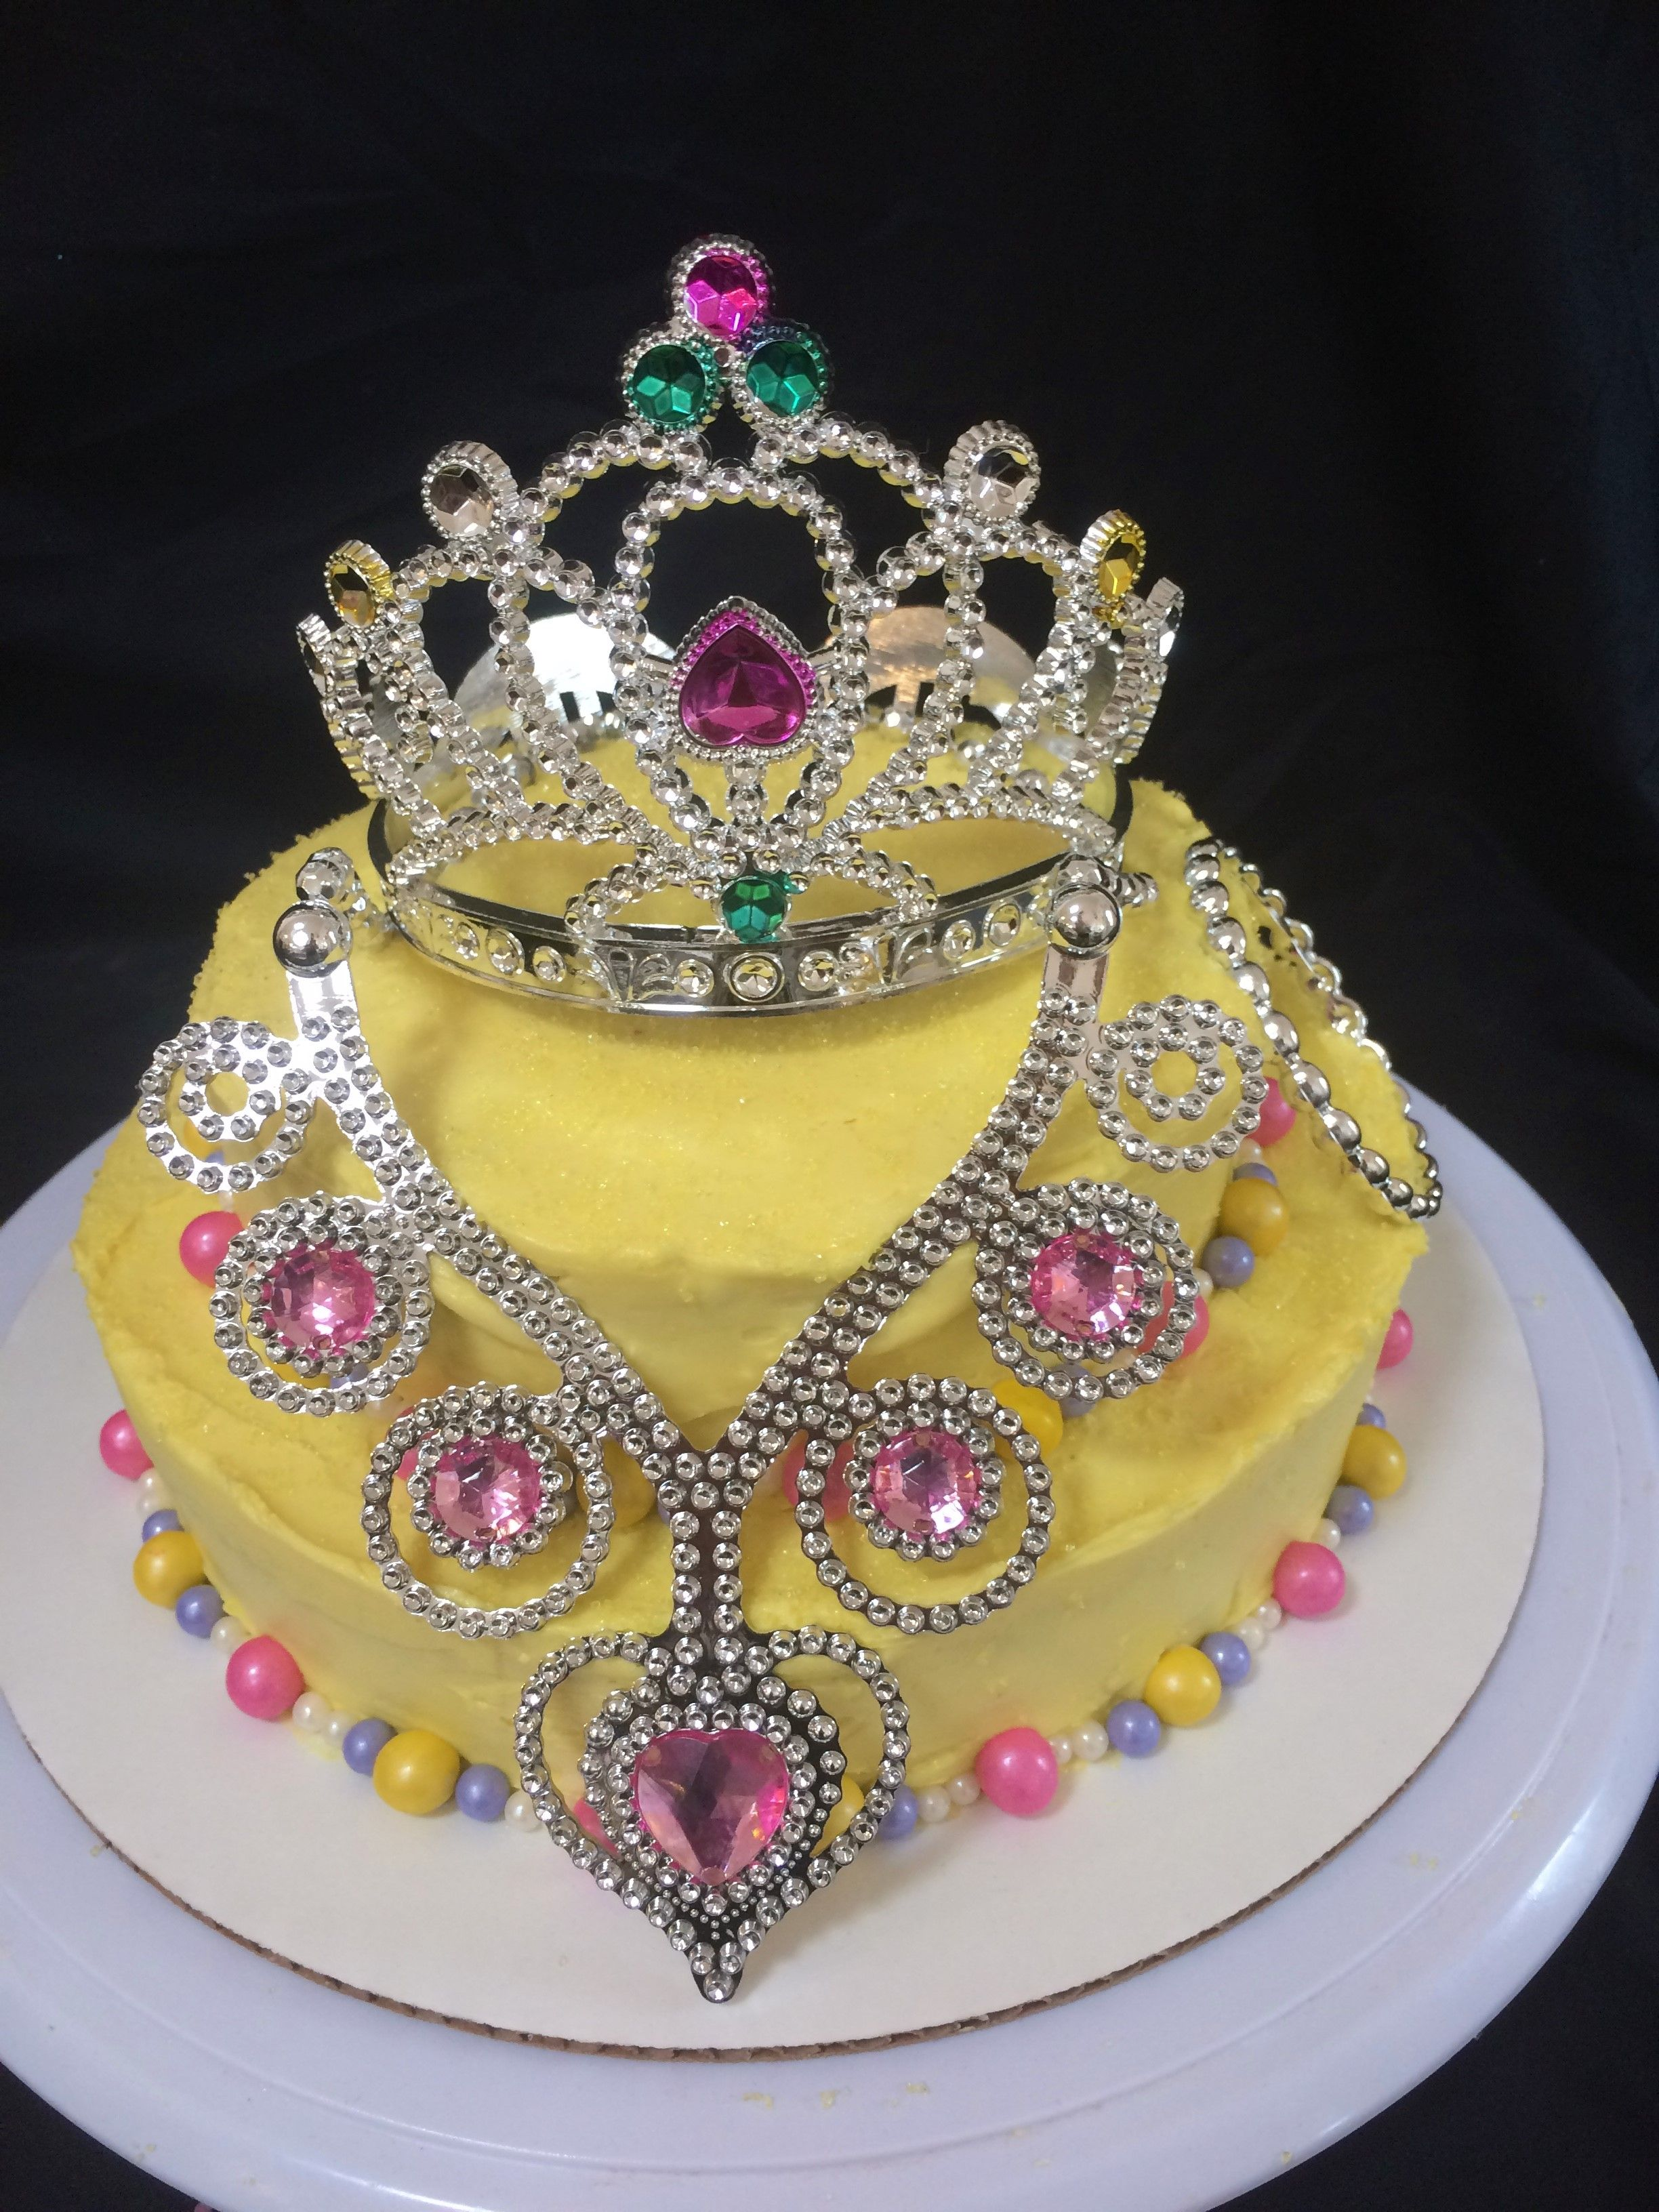 Phenomenal Princess Crown Jewels Cake Little Girl Birthday Jewel Cake Funny Birthday Cards Online Unhofree Goldxyz